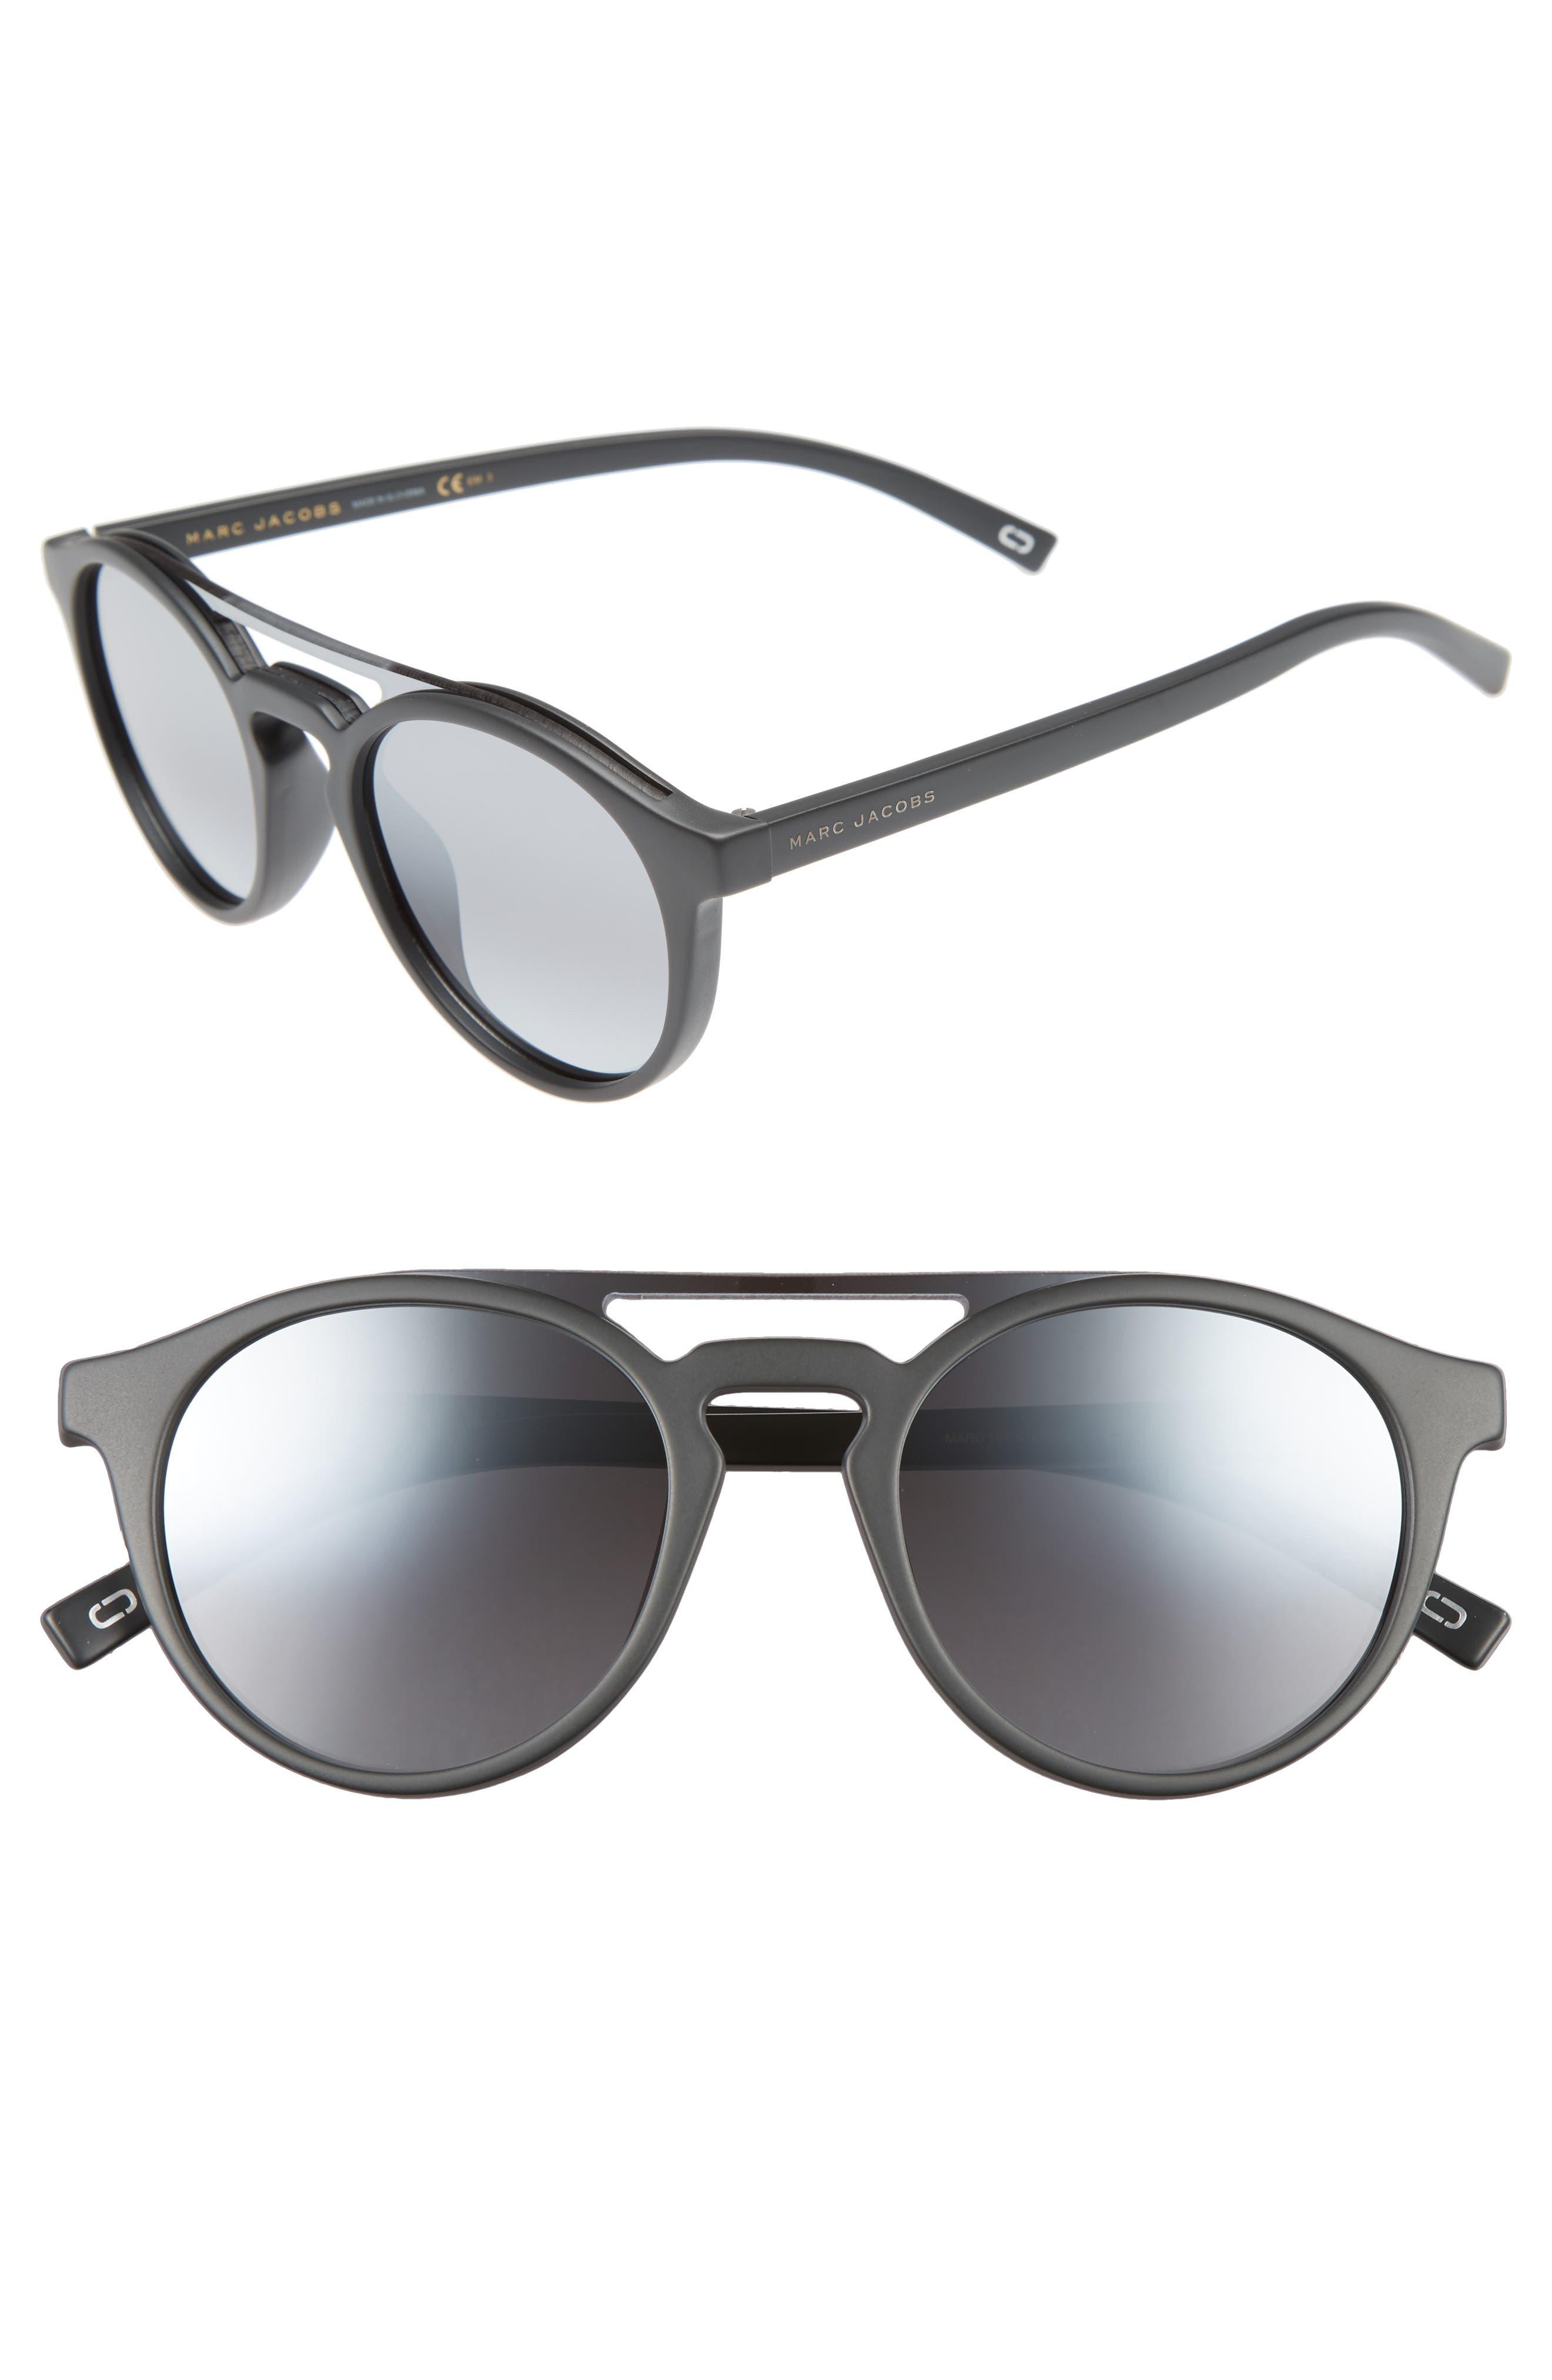 99mm Round Brow Bar Sunglasses,                             Main thumbnail 1, color,                             Dark Grey